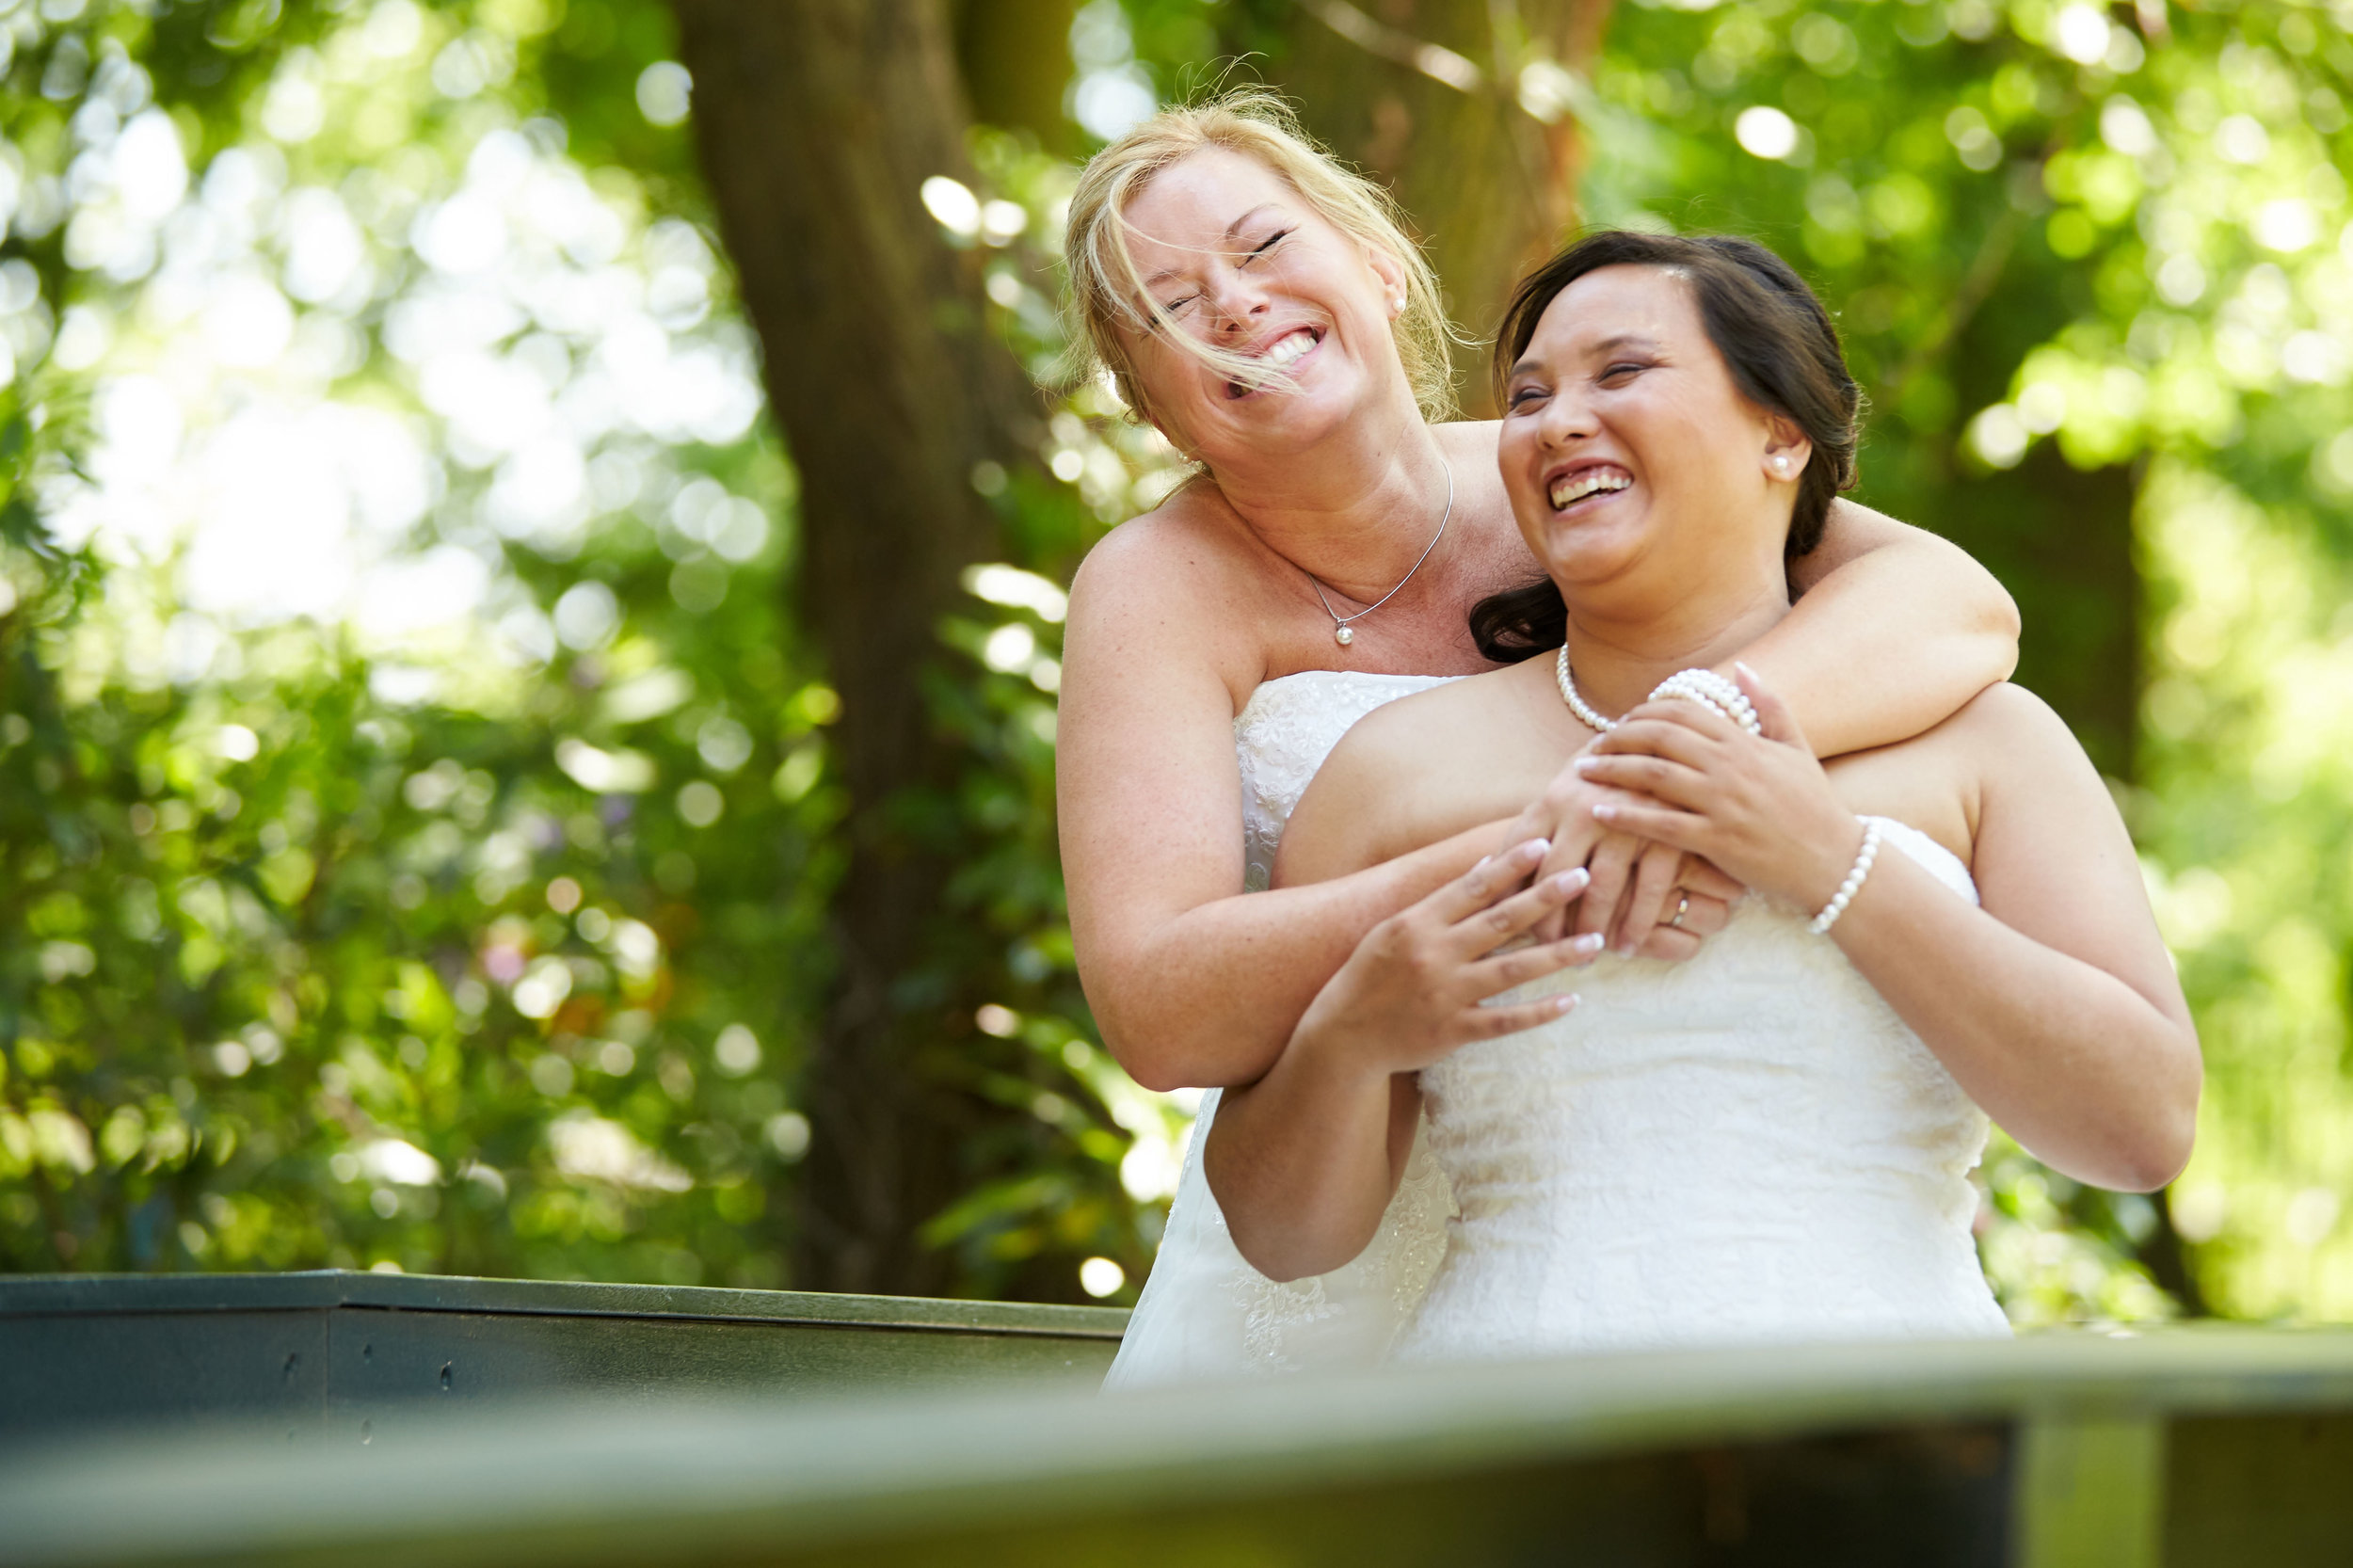 trouwshoot-bruidsfotografie-trouwfoto-feestfotografie-Prunella en Cora19.jpg